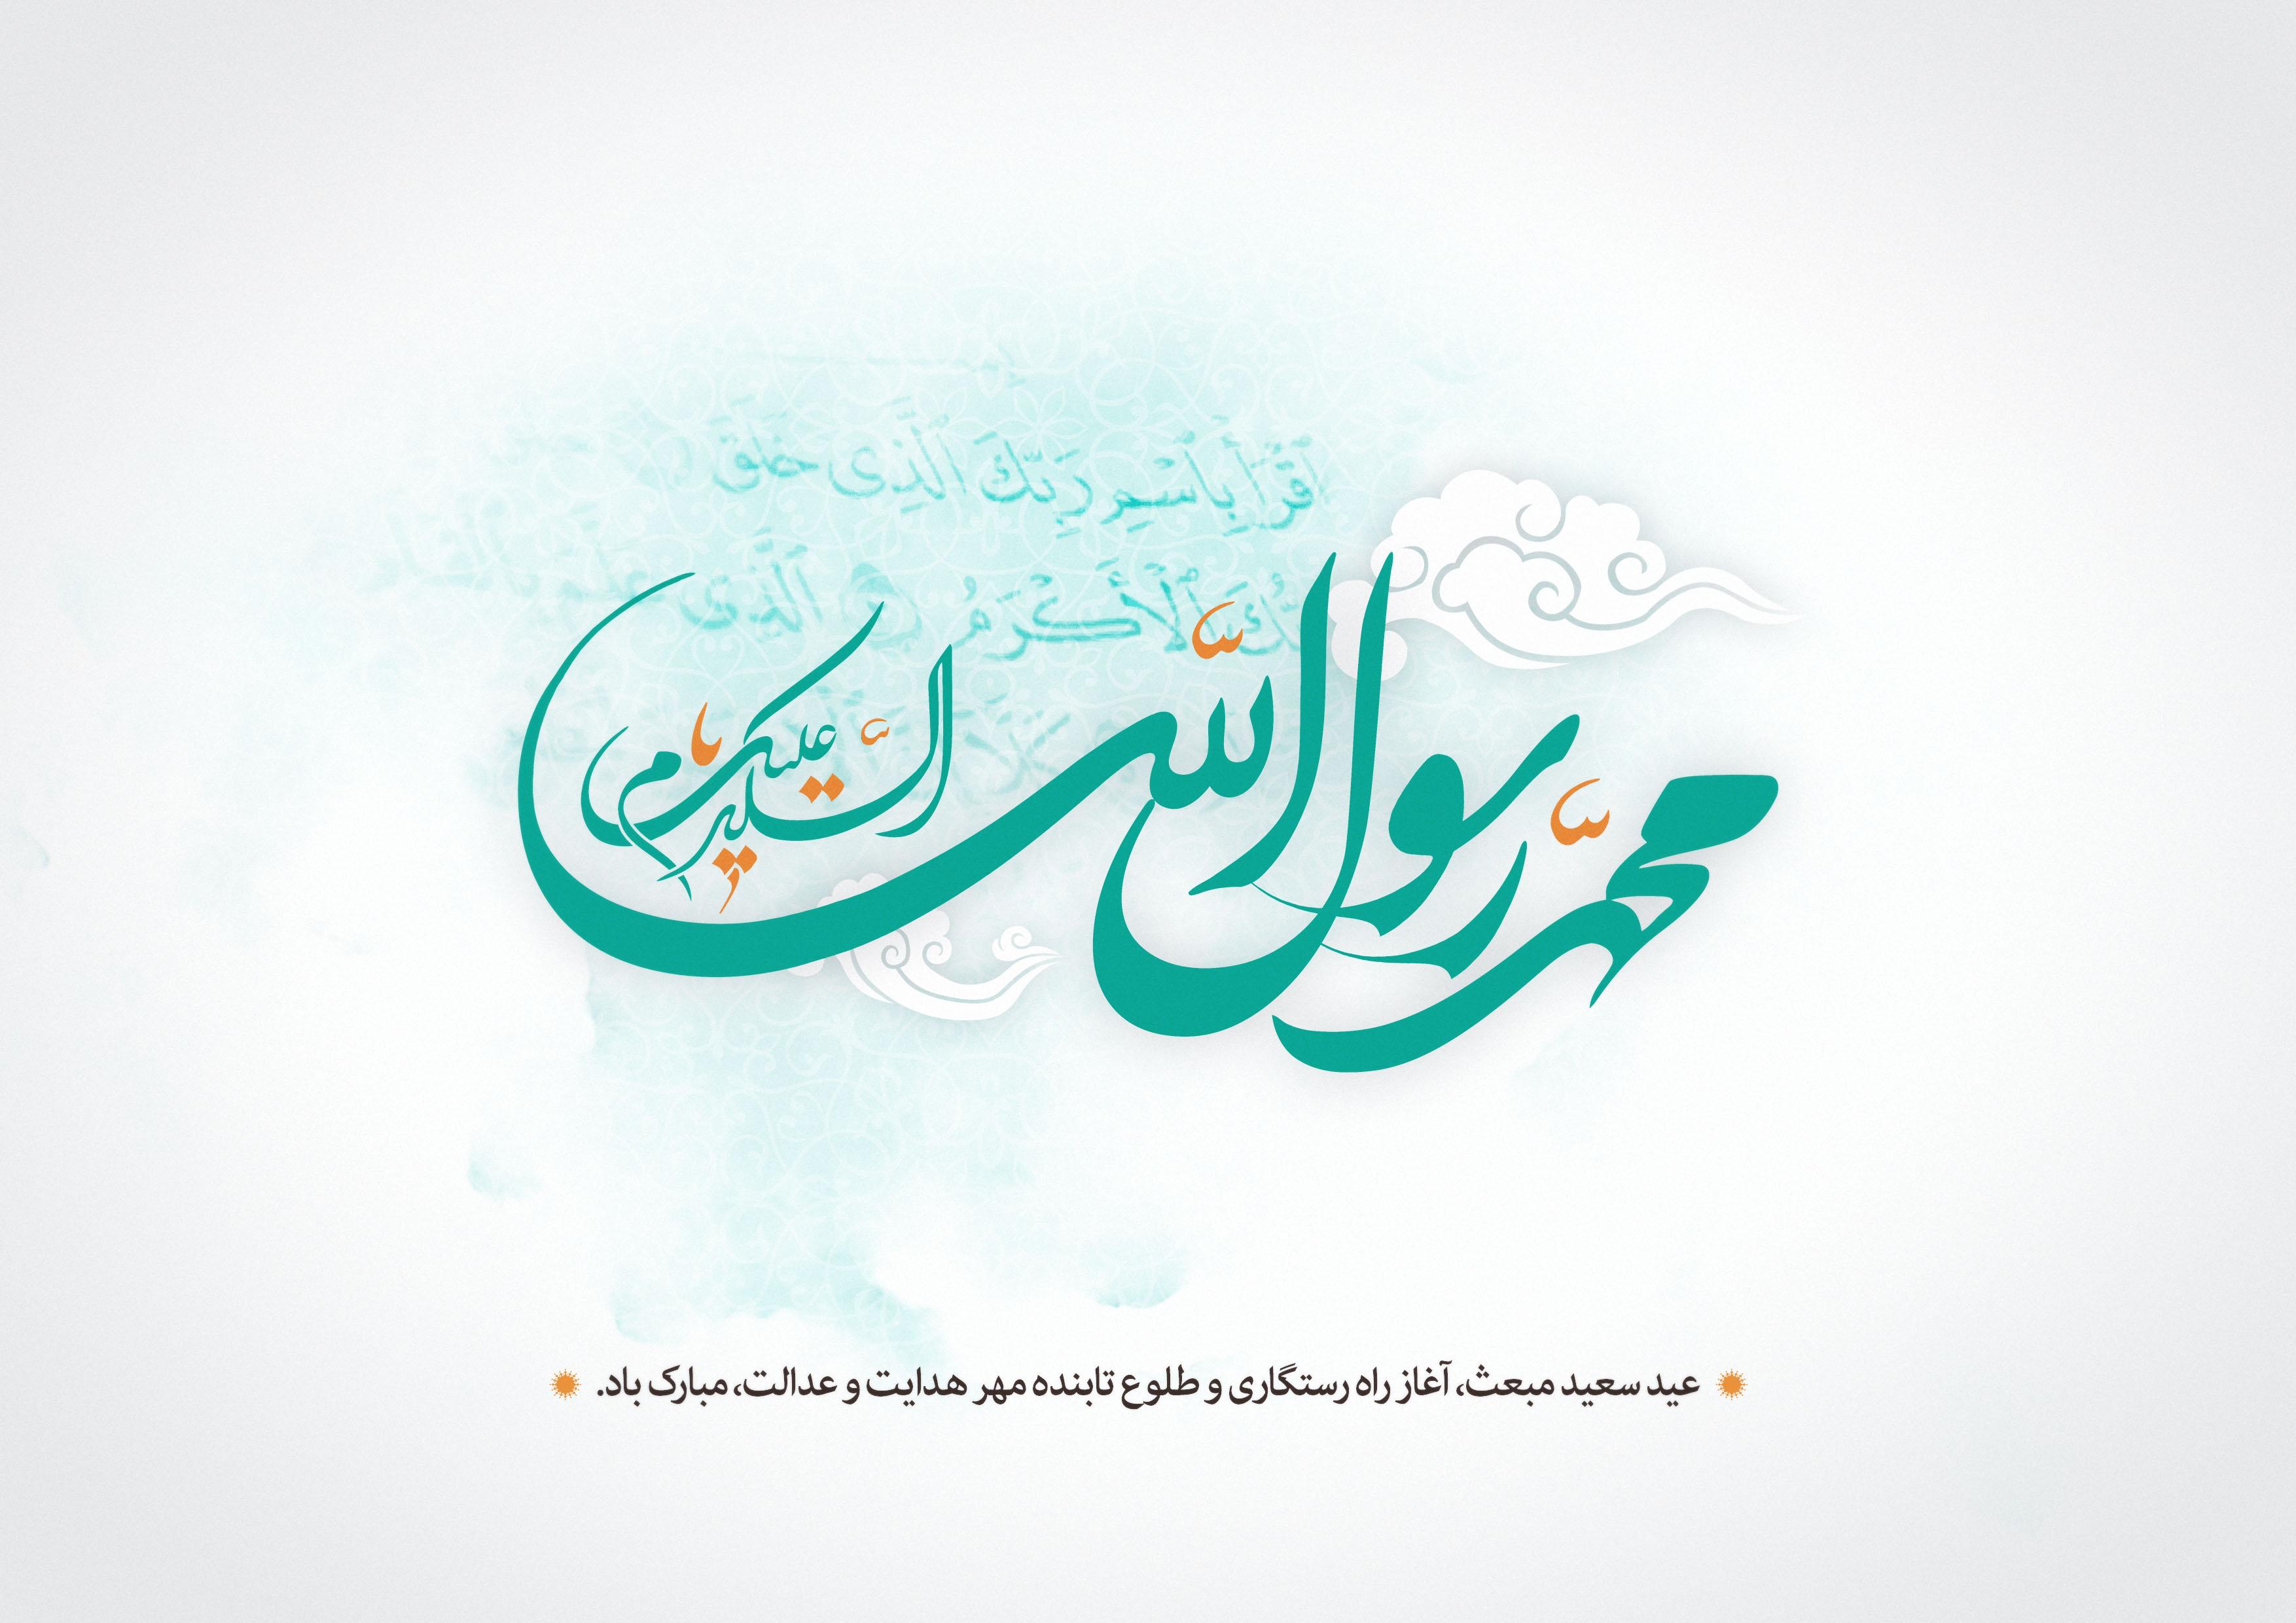 http://static2.golestan24.com/servev2/GxUEd30g7Qu9/WgMjZgaM8IE,/Mabas_Hazrat_Rasol_1_hq.jpg